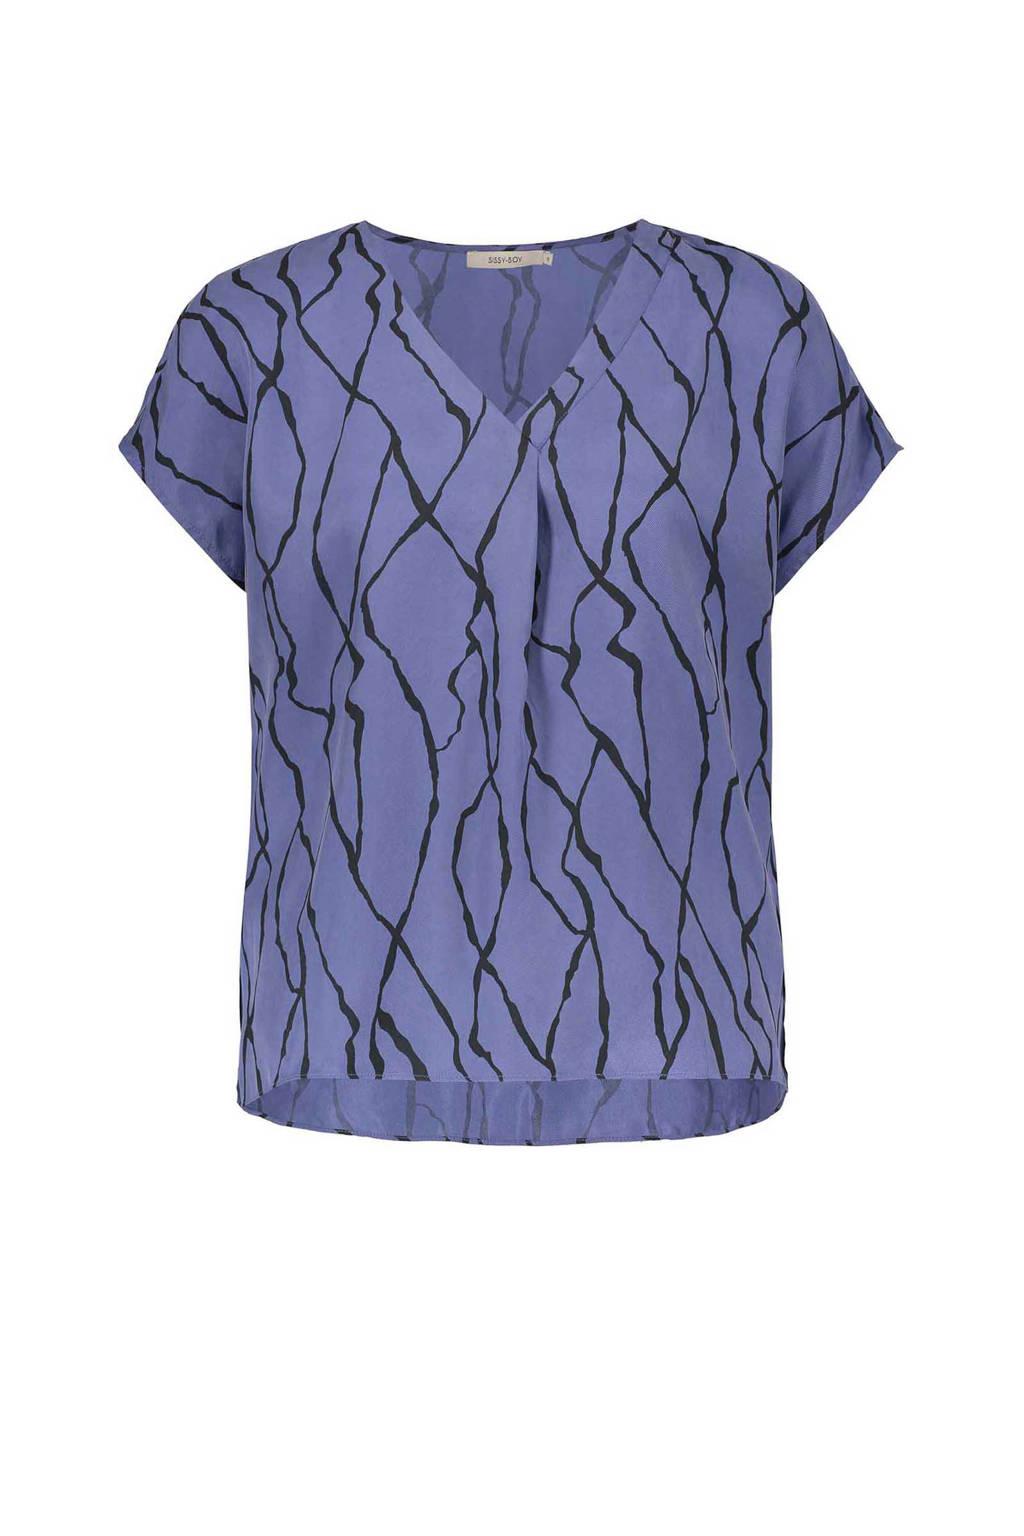 Sissy-Boy loose fit top, lavendel blauw